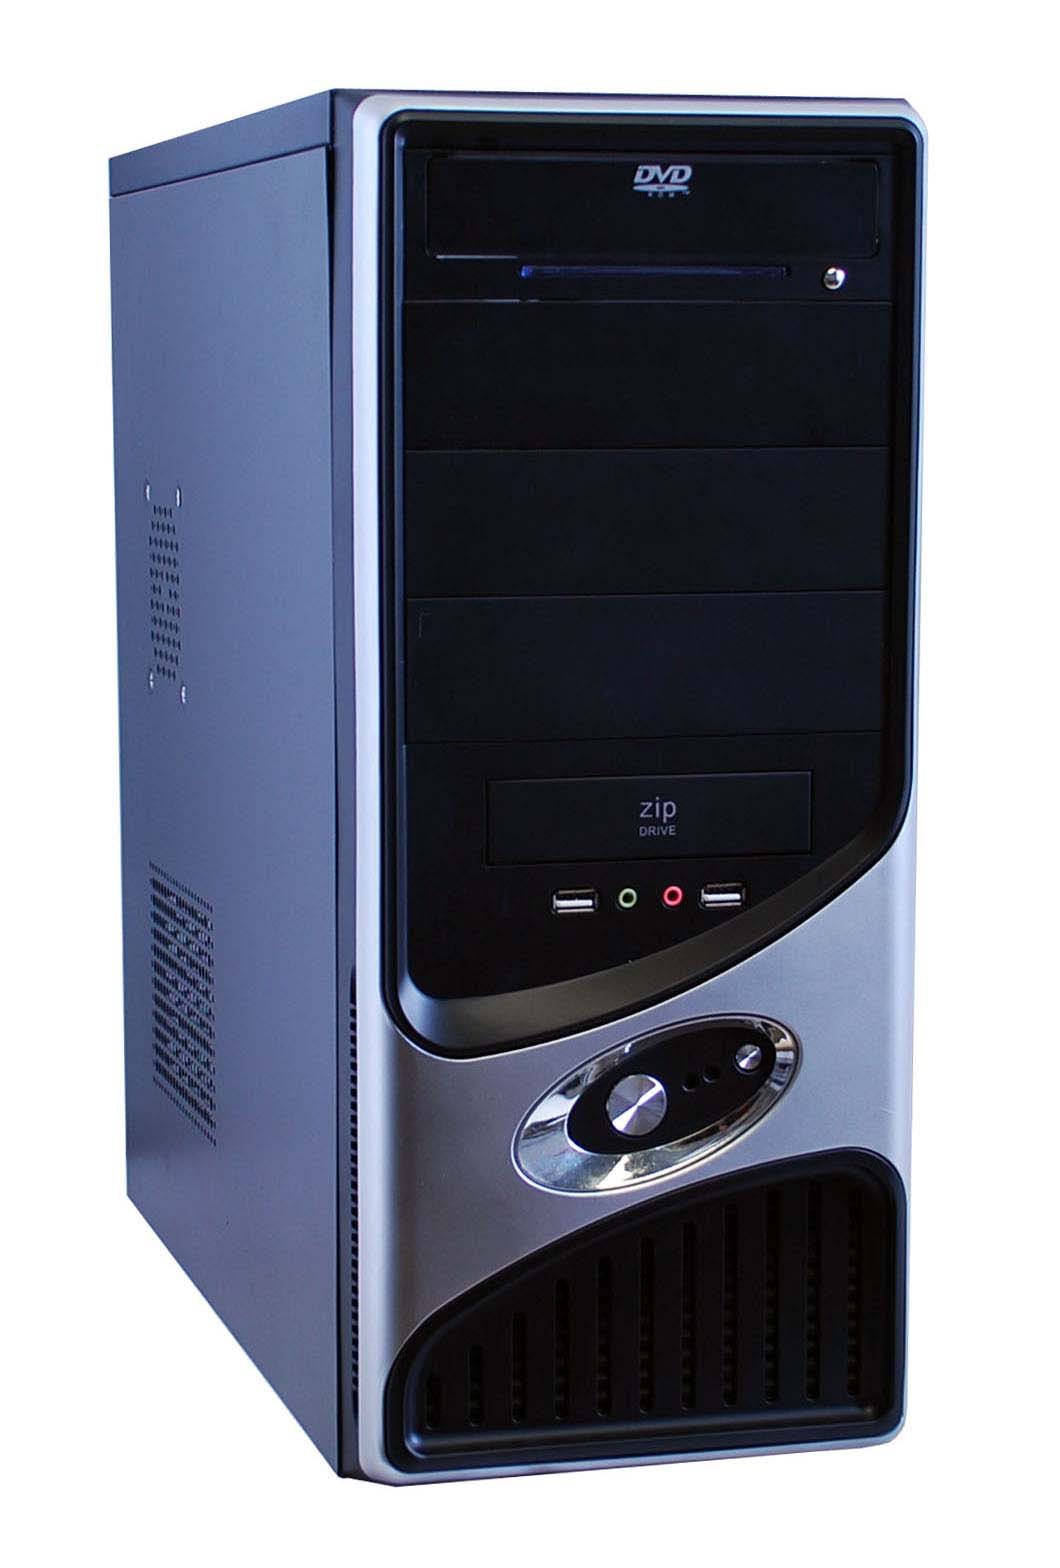 KOMPUTER: Beberapa contoh komponen komputer